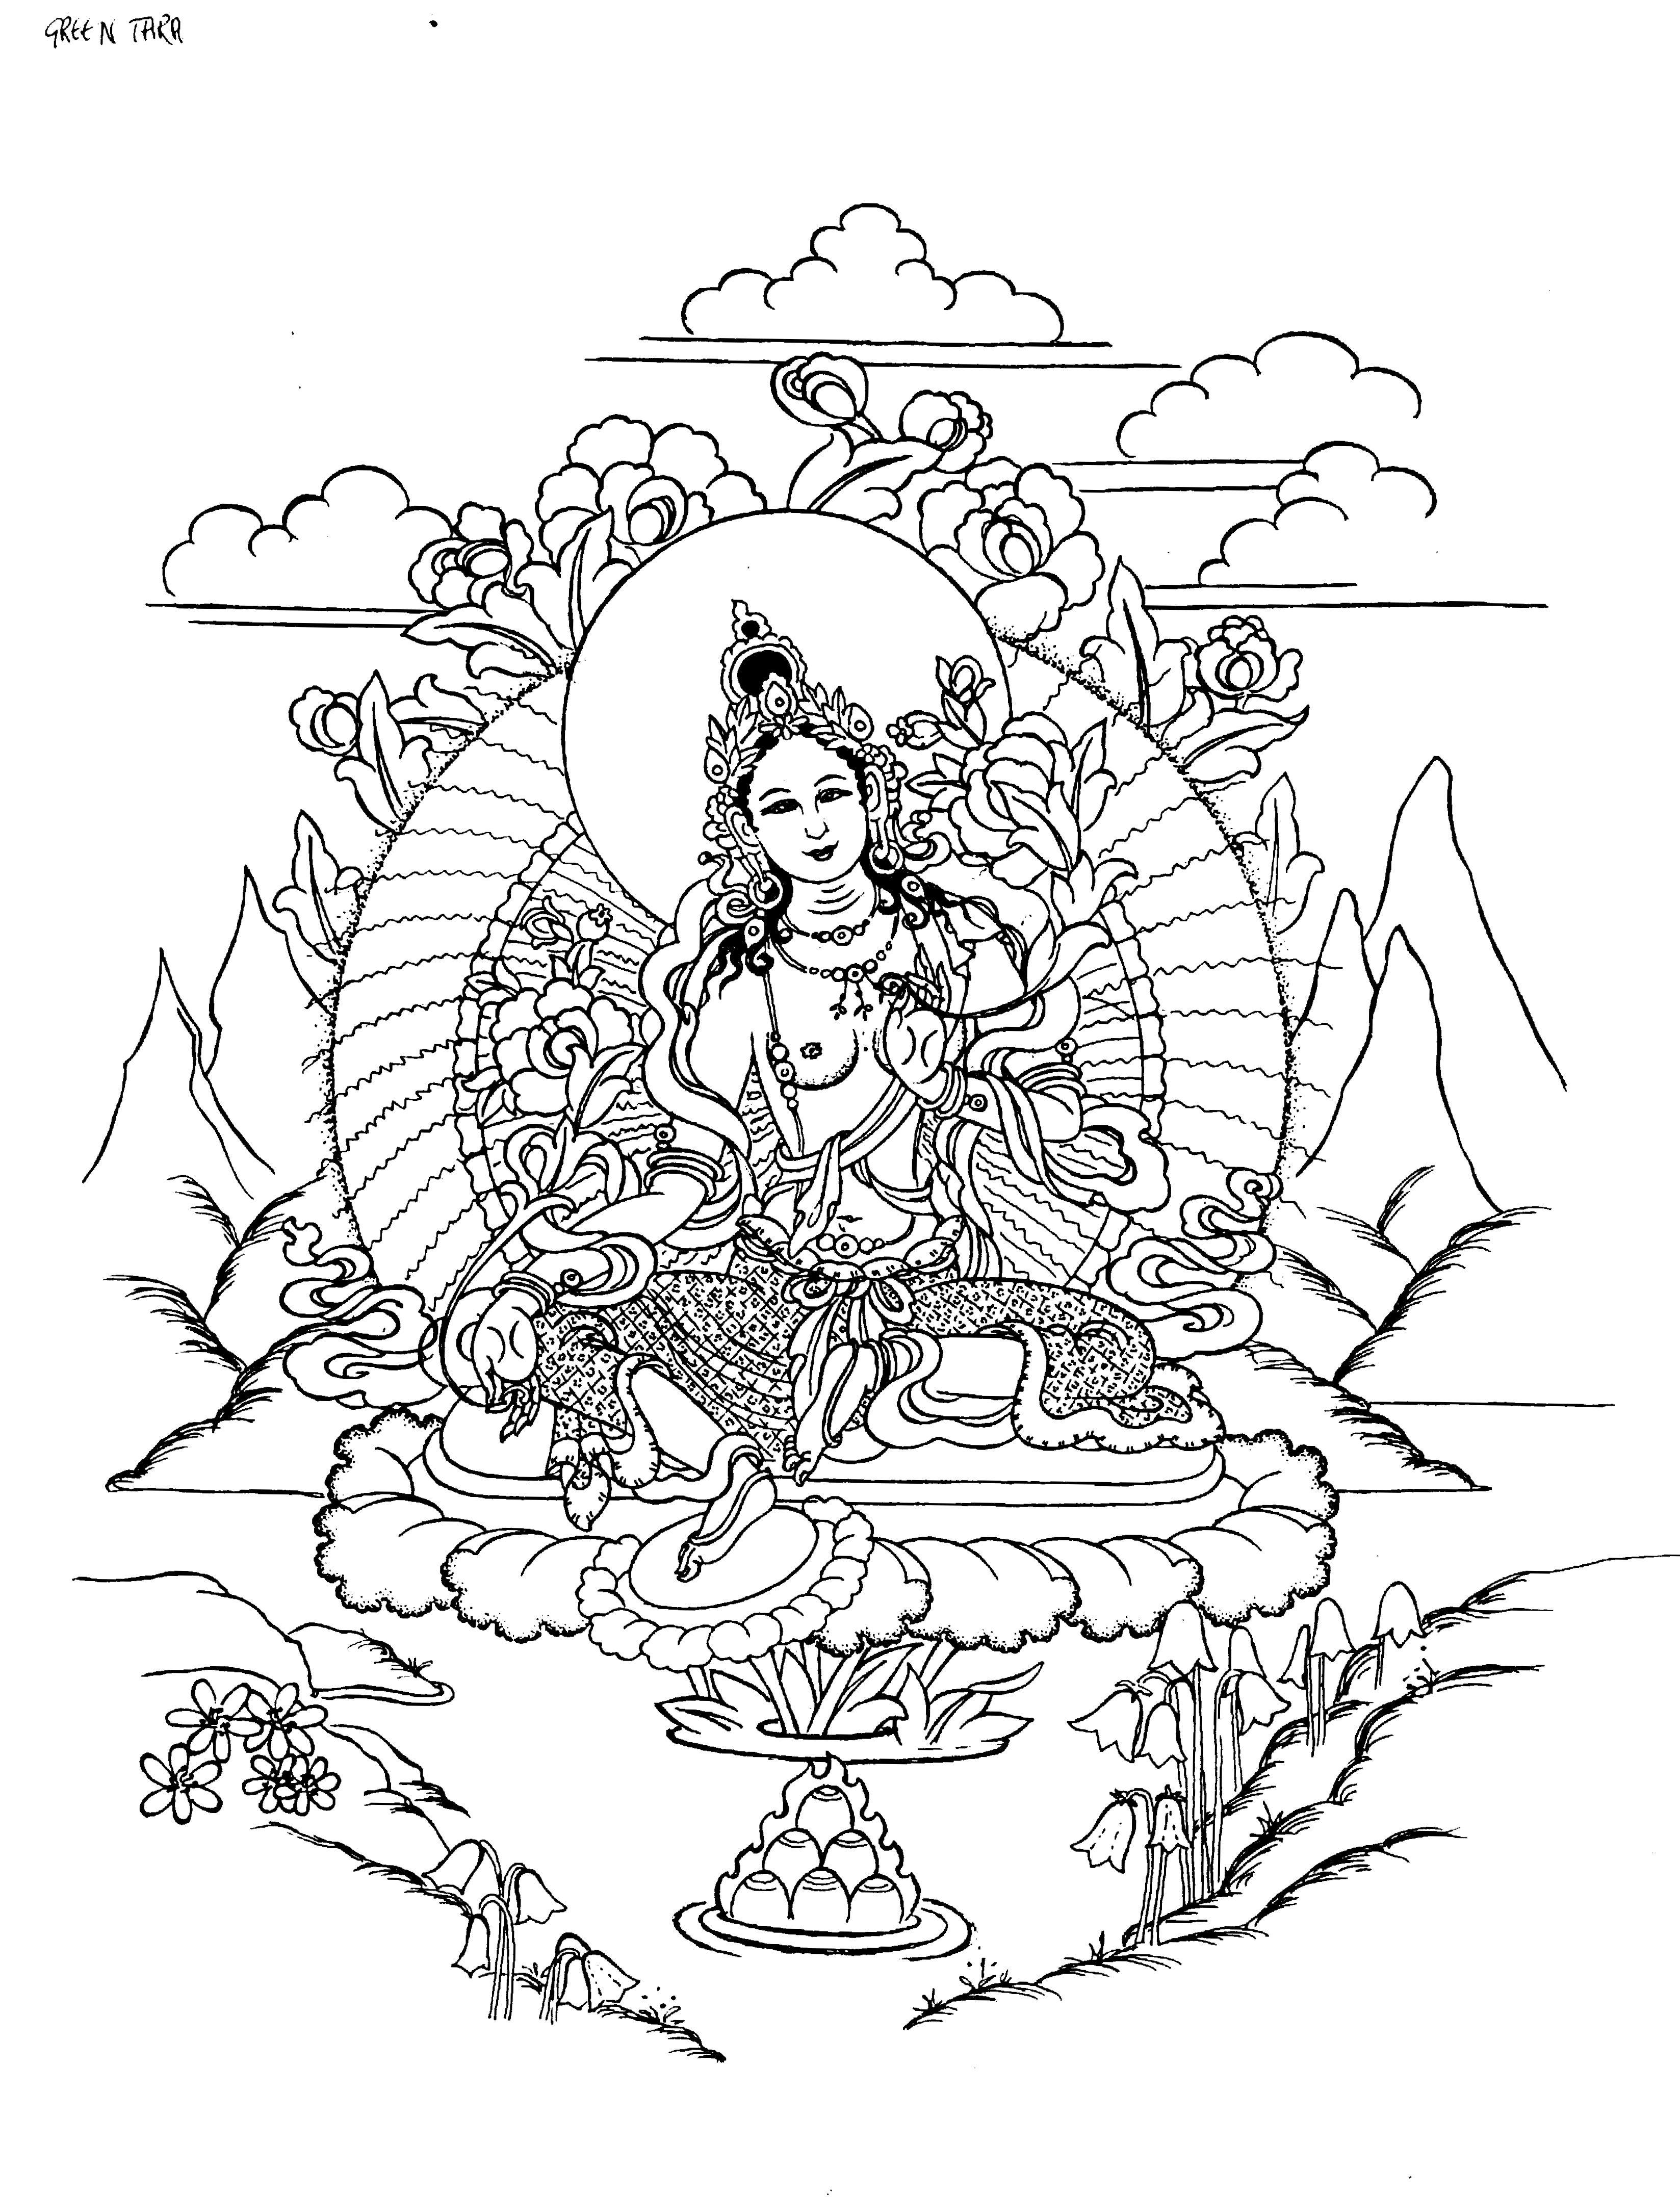 Http Meditationcharlotte Org Wp Content Uploads 2012 10 Green